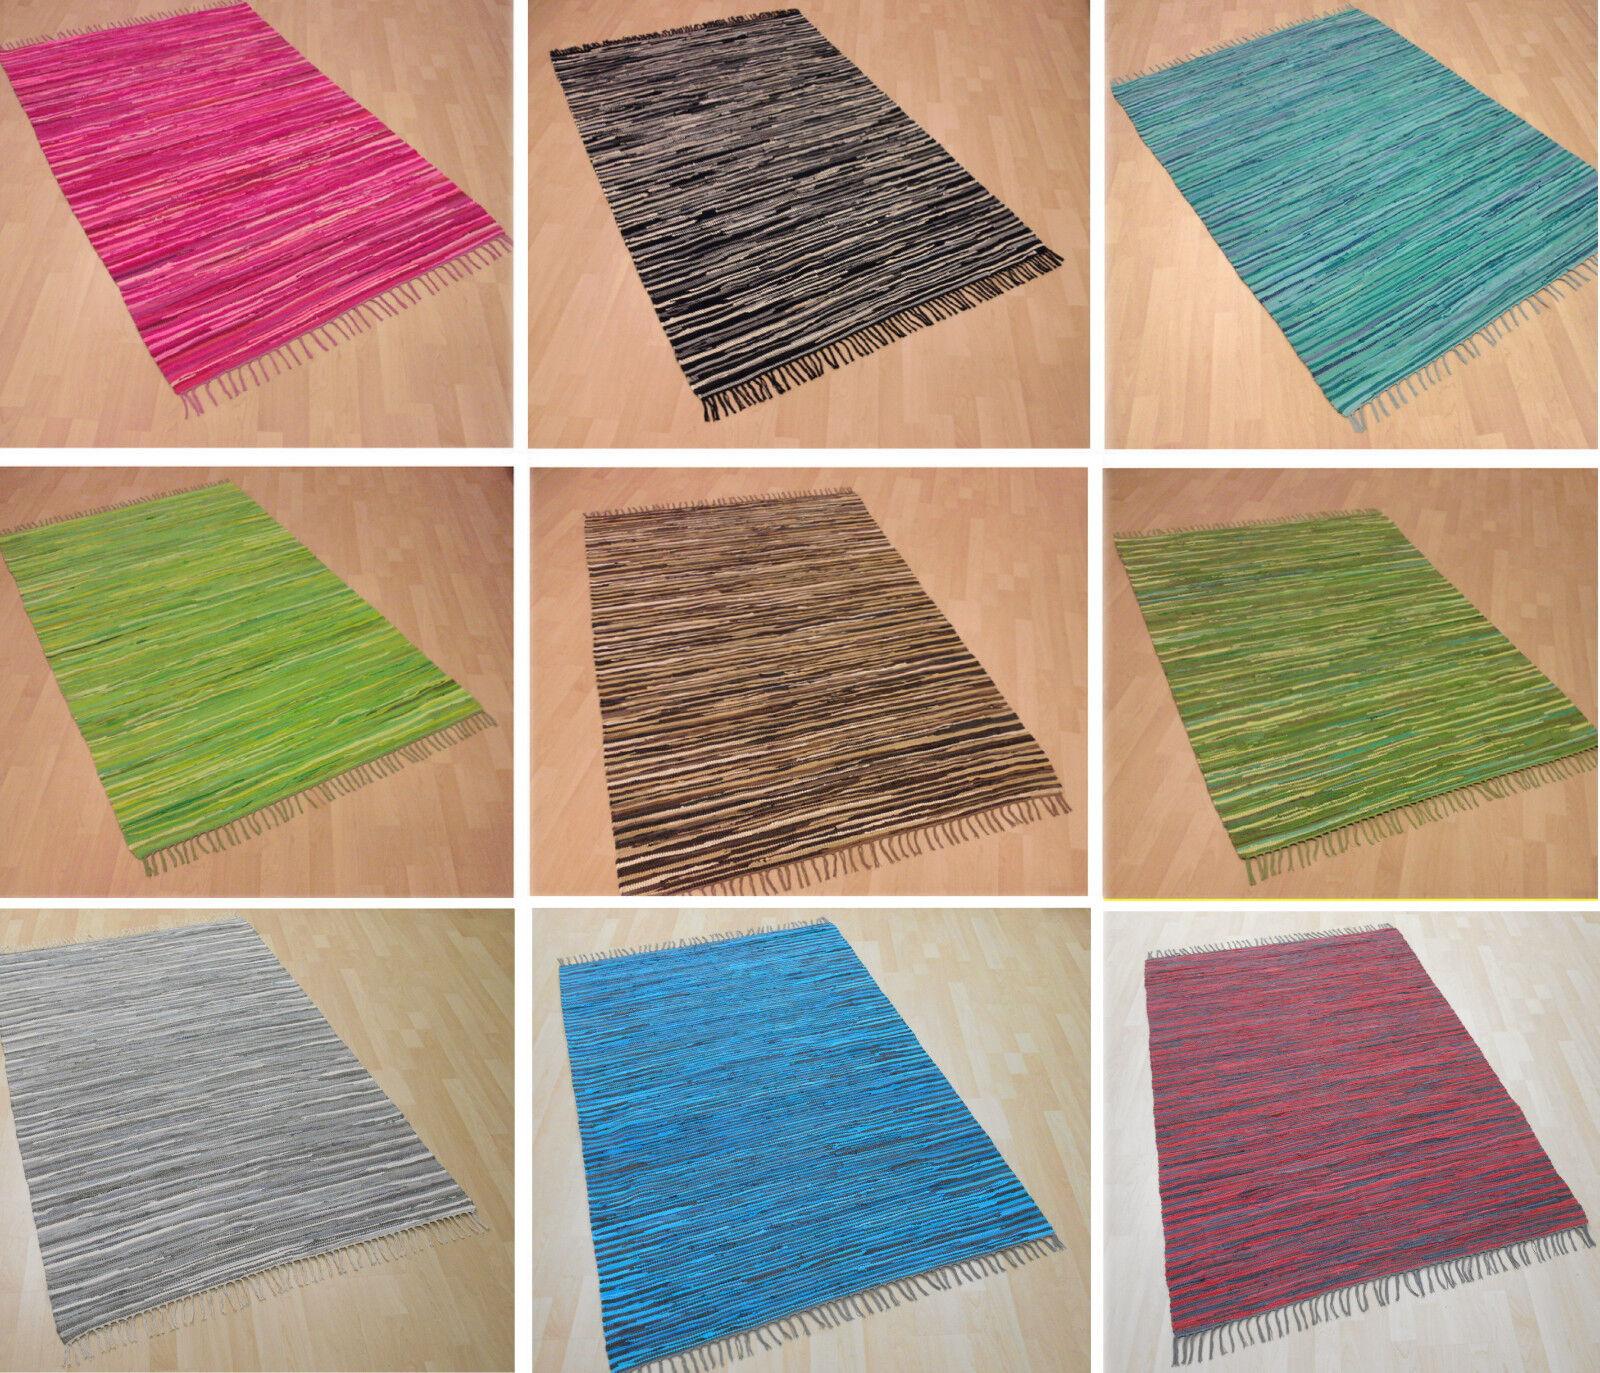 Teppich Fleckerl Fleckerlteppich Handwebteppich gestreift Baumwolle waschbar NEU